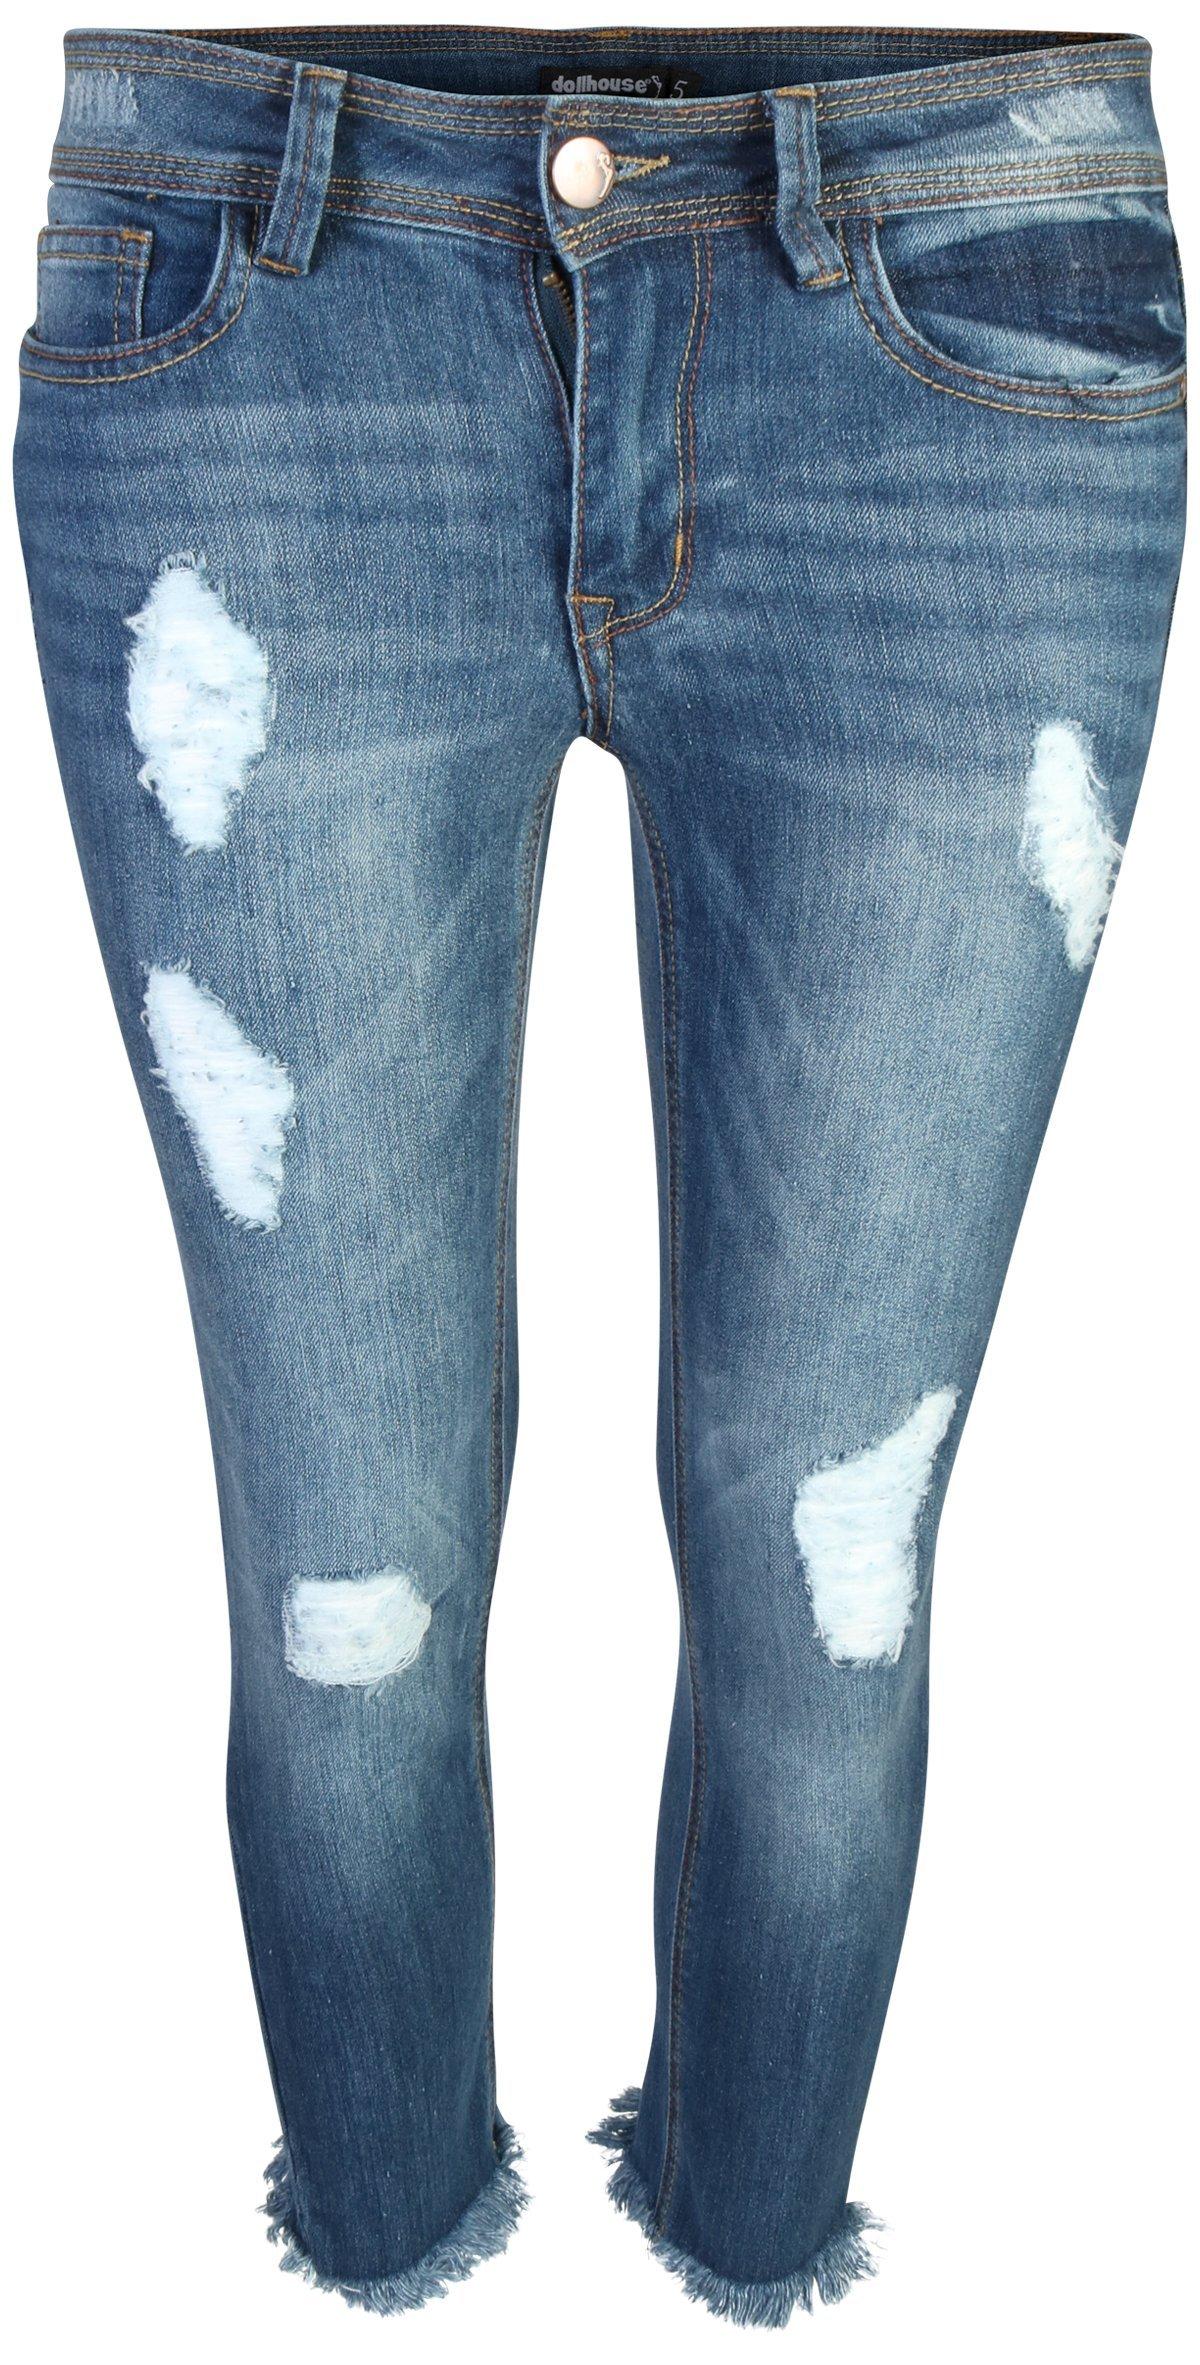 dollhouse Women's Distressed Stretch Frayed Hem Skinny Capri Jeans, Medium, Size 16'